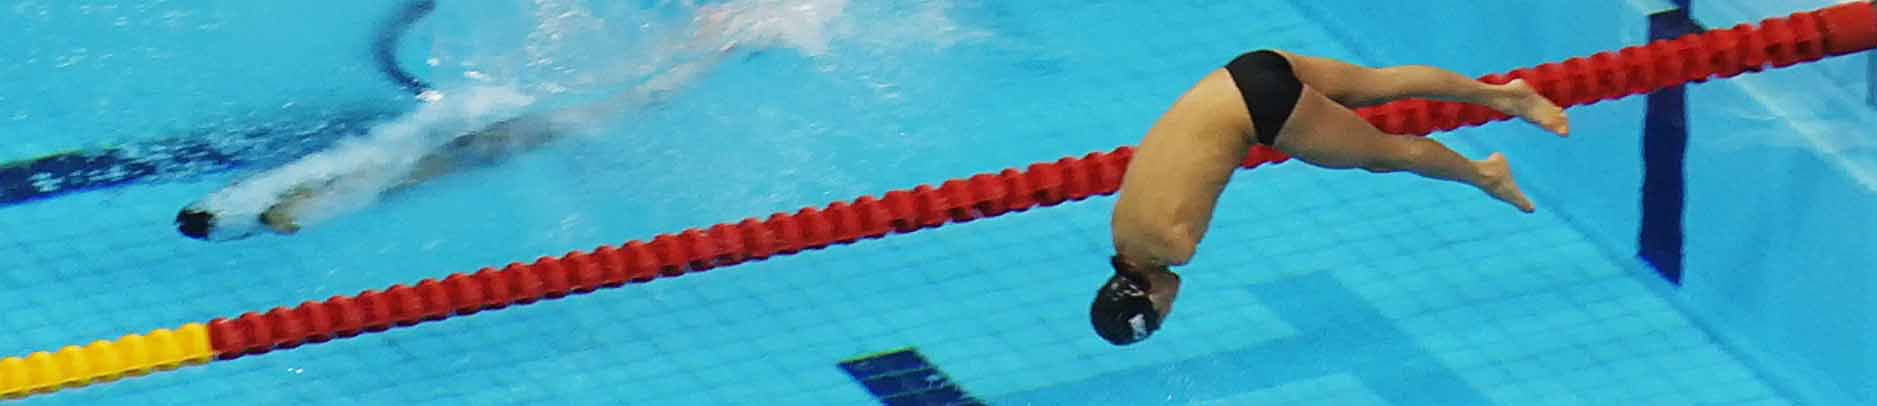 nuoto-paralimpico